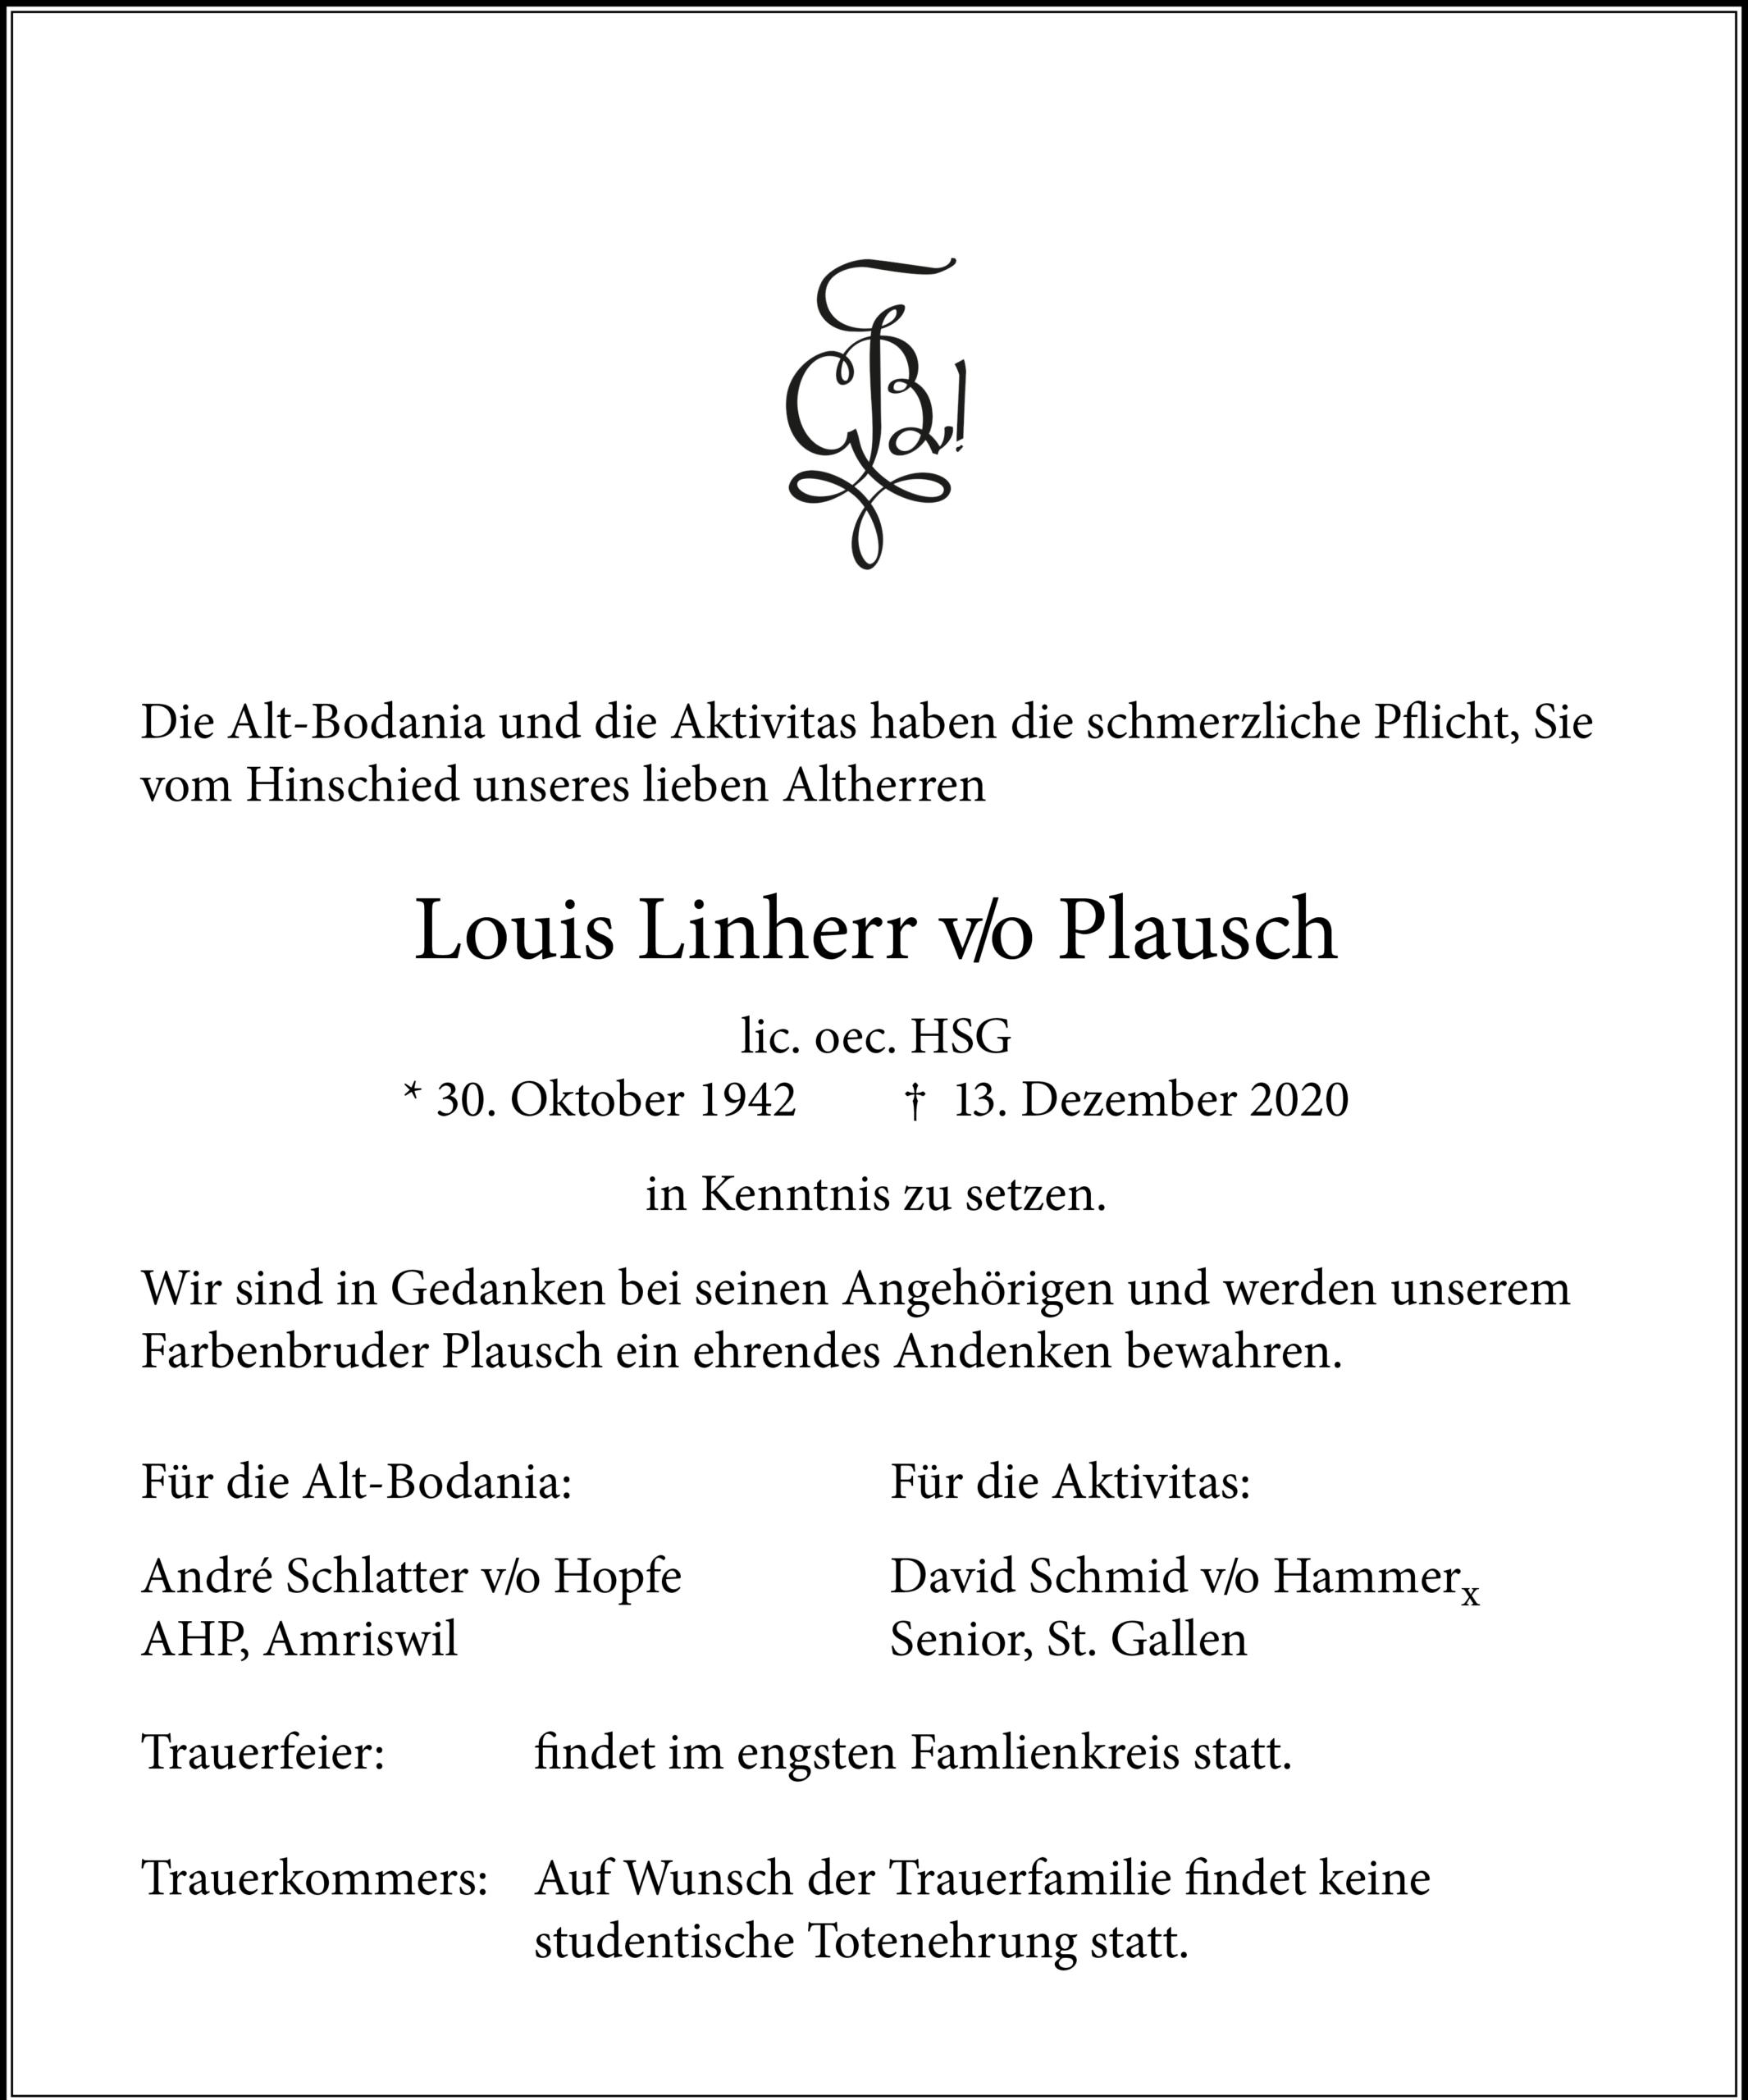 Louis Linherr v/o Plausch †